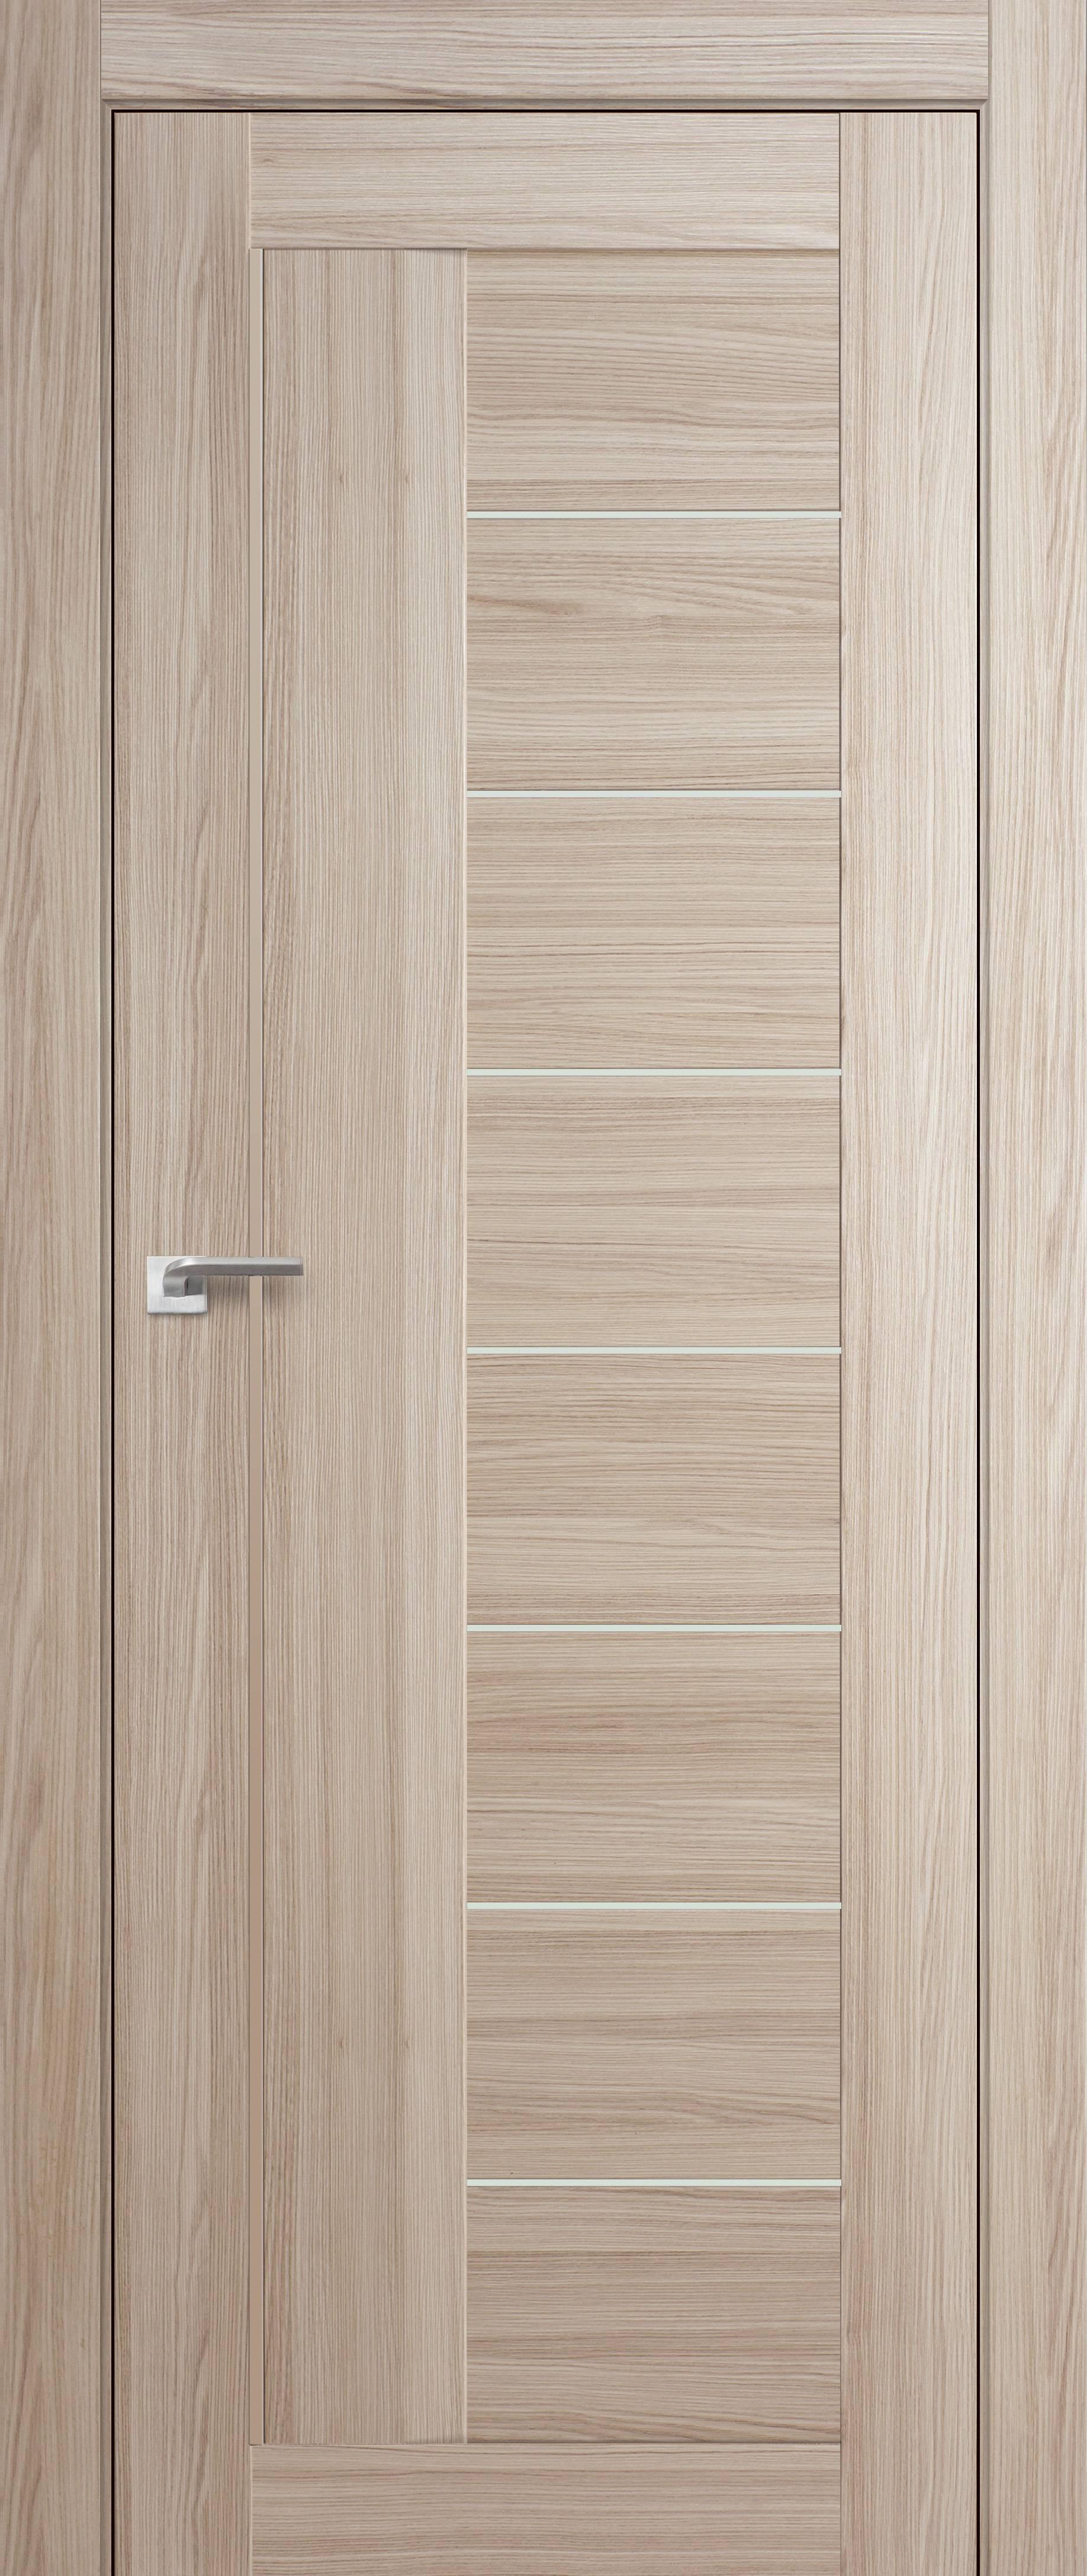 Фото двери Модель 17Х